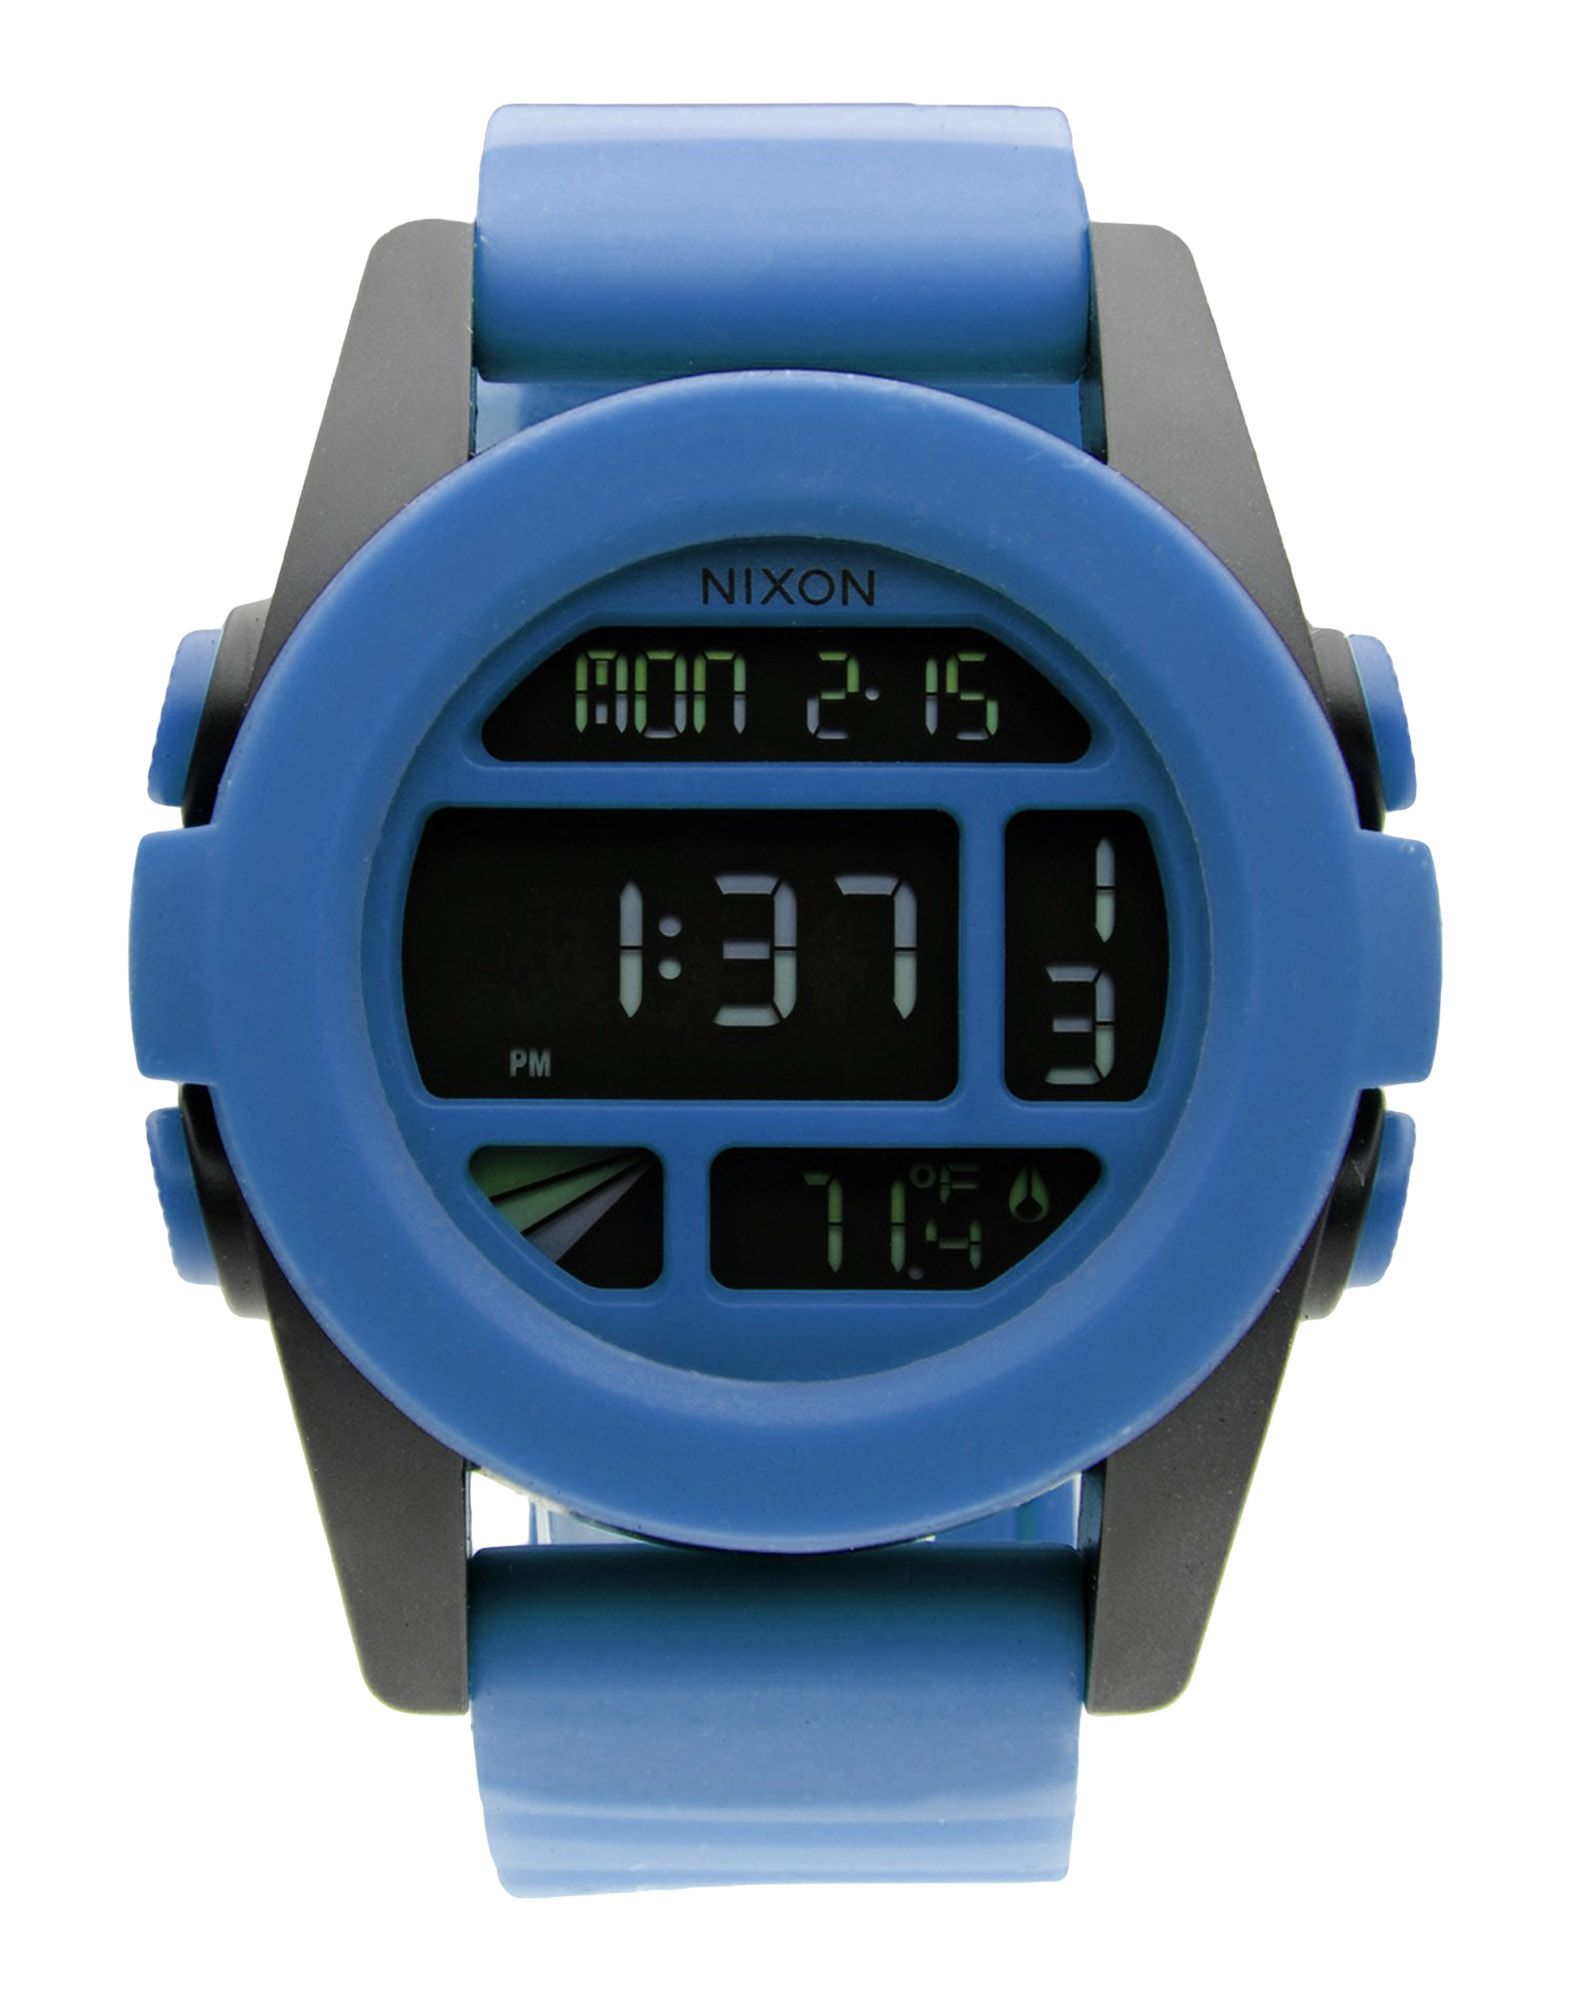 'Nixon Wrist Watches